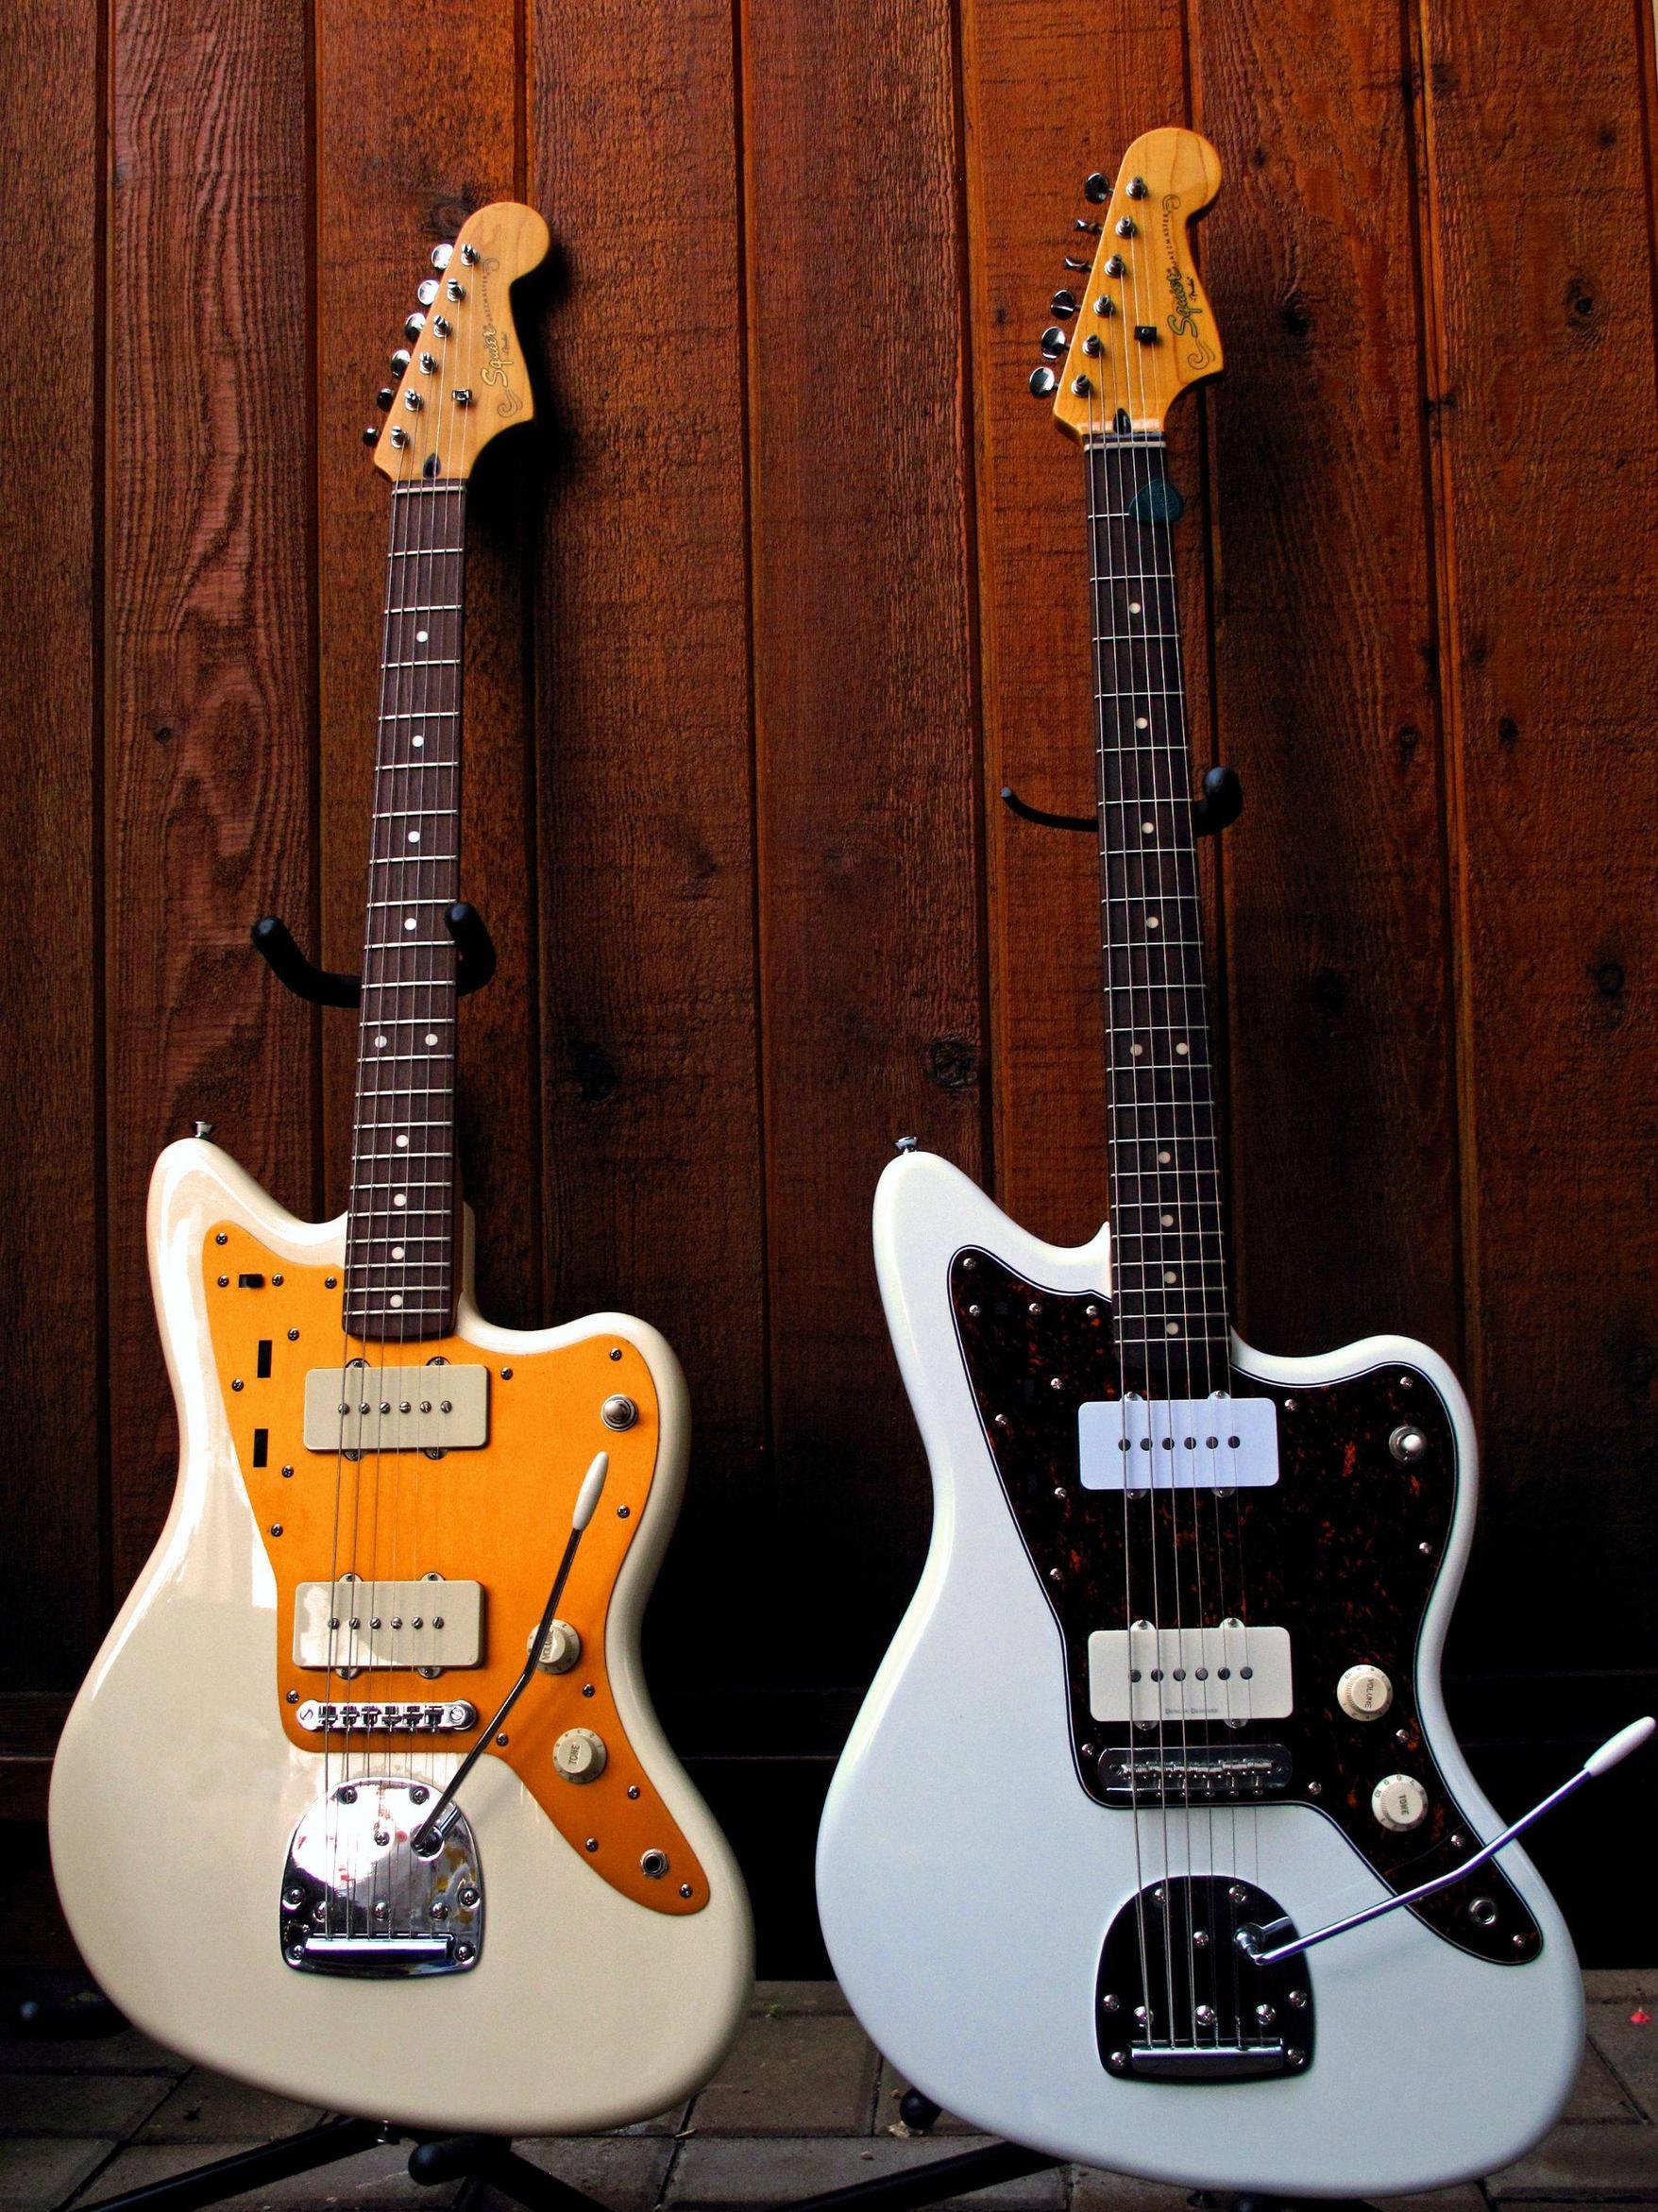 The Unique Guitar Blog December 2015 Jazzmaster 3 Way Switch